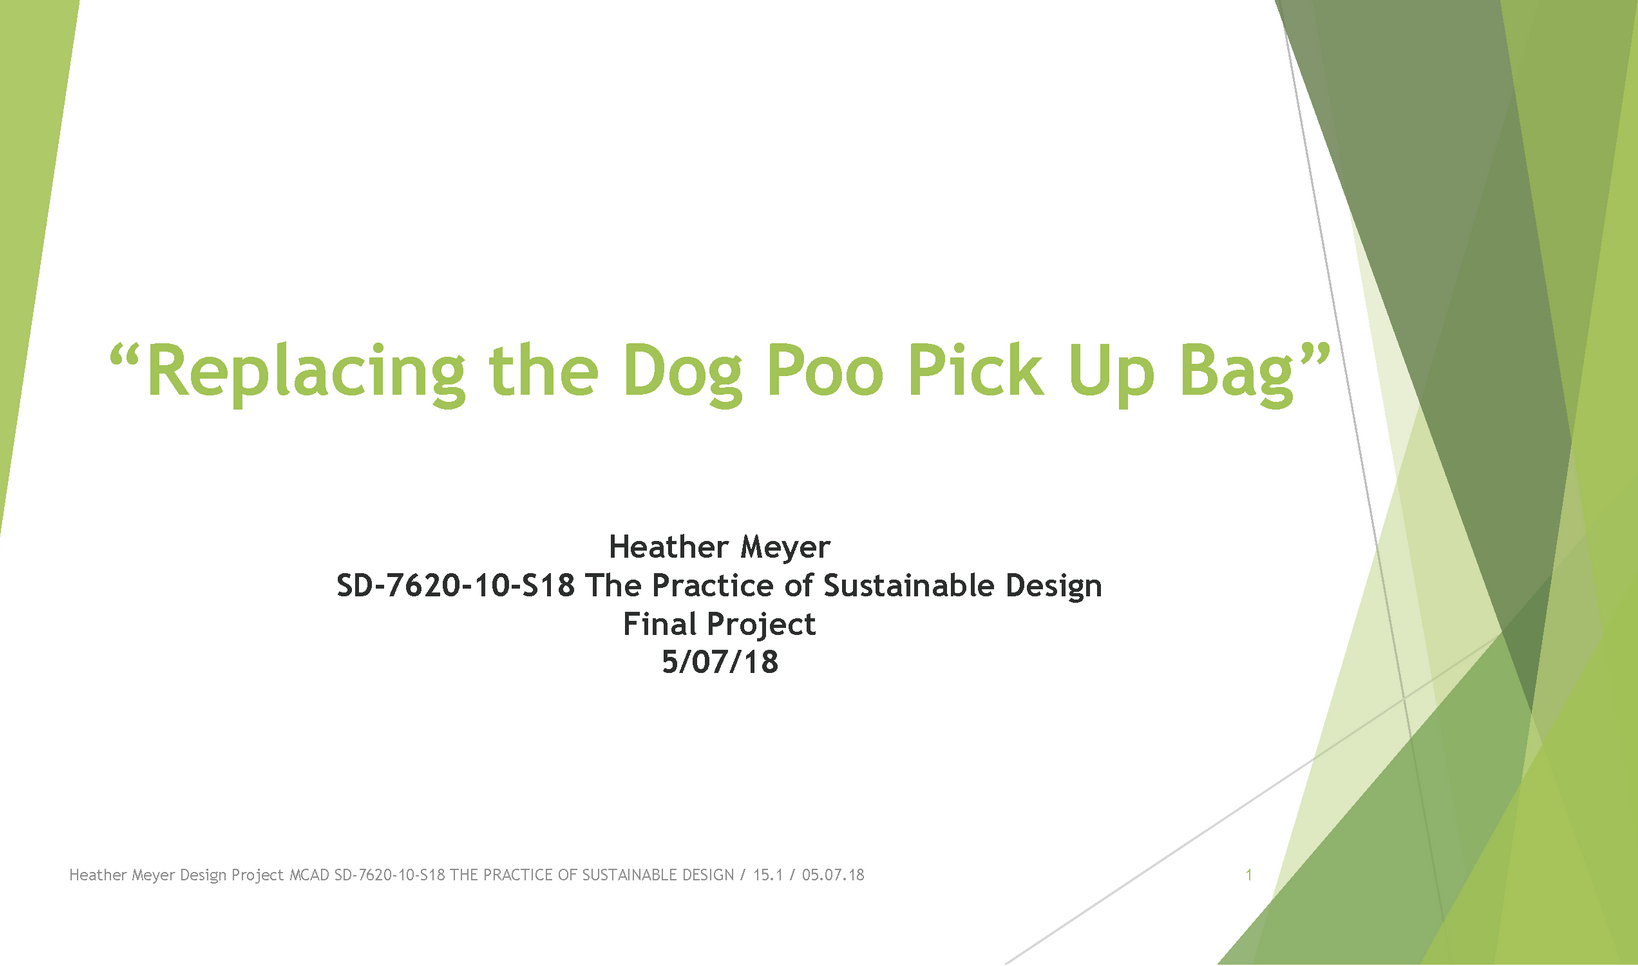 Sustainable Design Project Presentation ; Heather Meyer